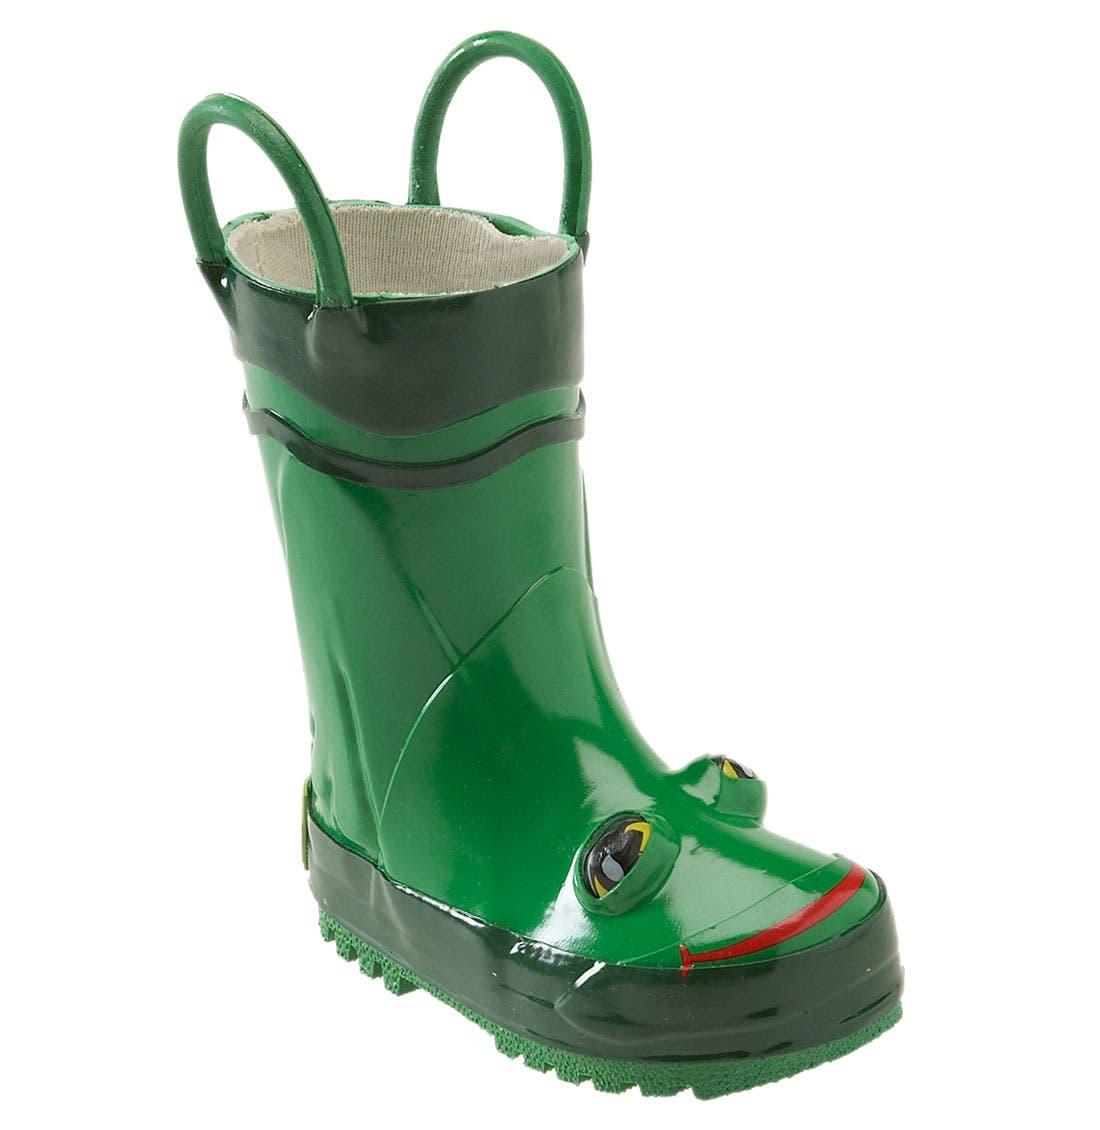 Alternate Image 1 Selected - Western Chief 'Frog' Rain Boot (Walker, Toddler, Little Kid & Big Kid)